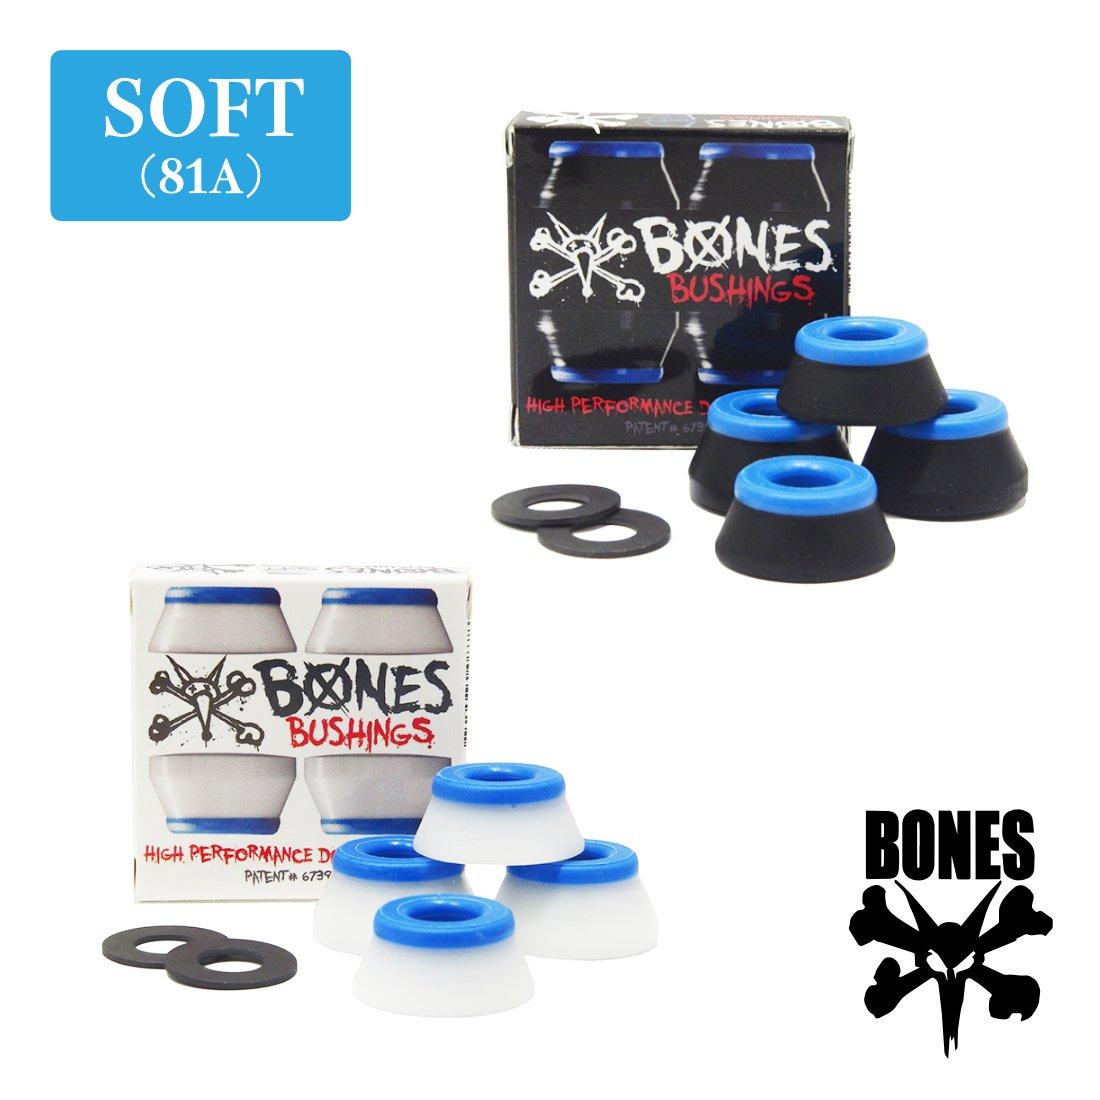 【BONES】 Hardcore Bush - Soft